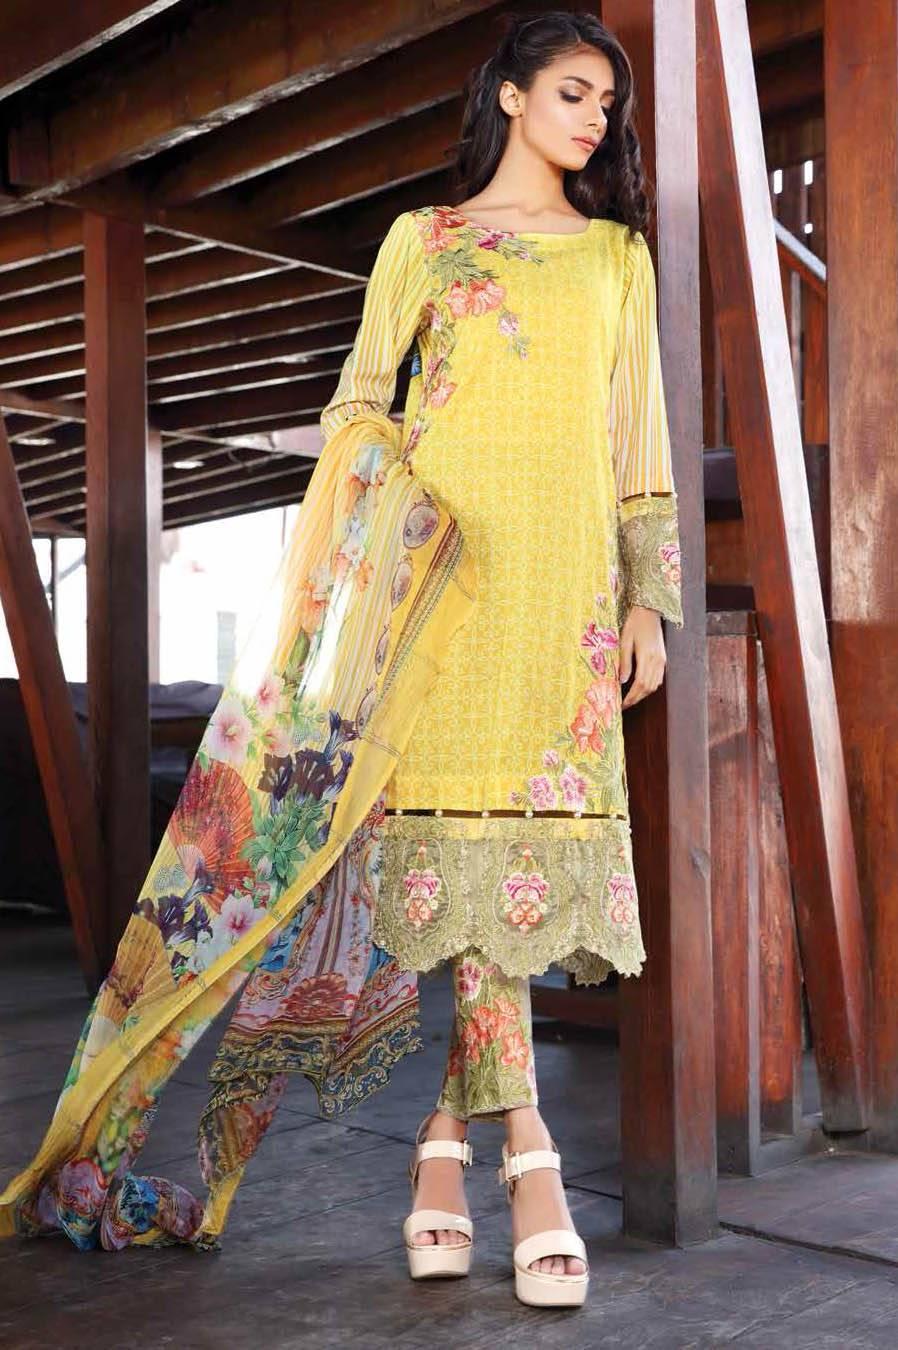 Motifz Embroidered Lawn Unstitched 3 Piece Suit MT17L 1572A